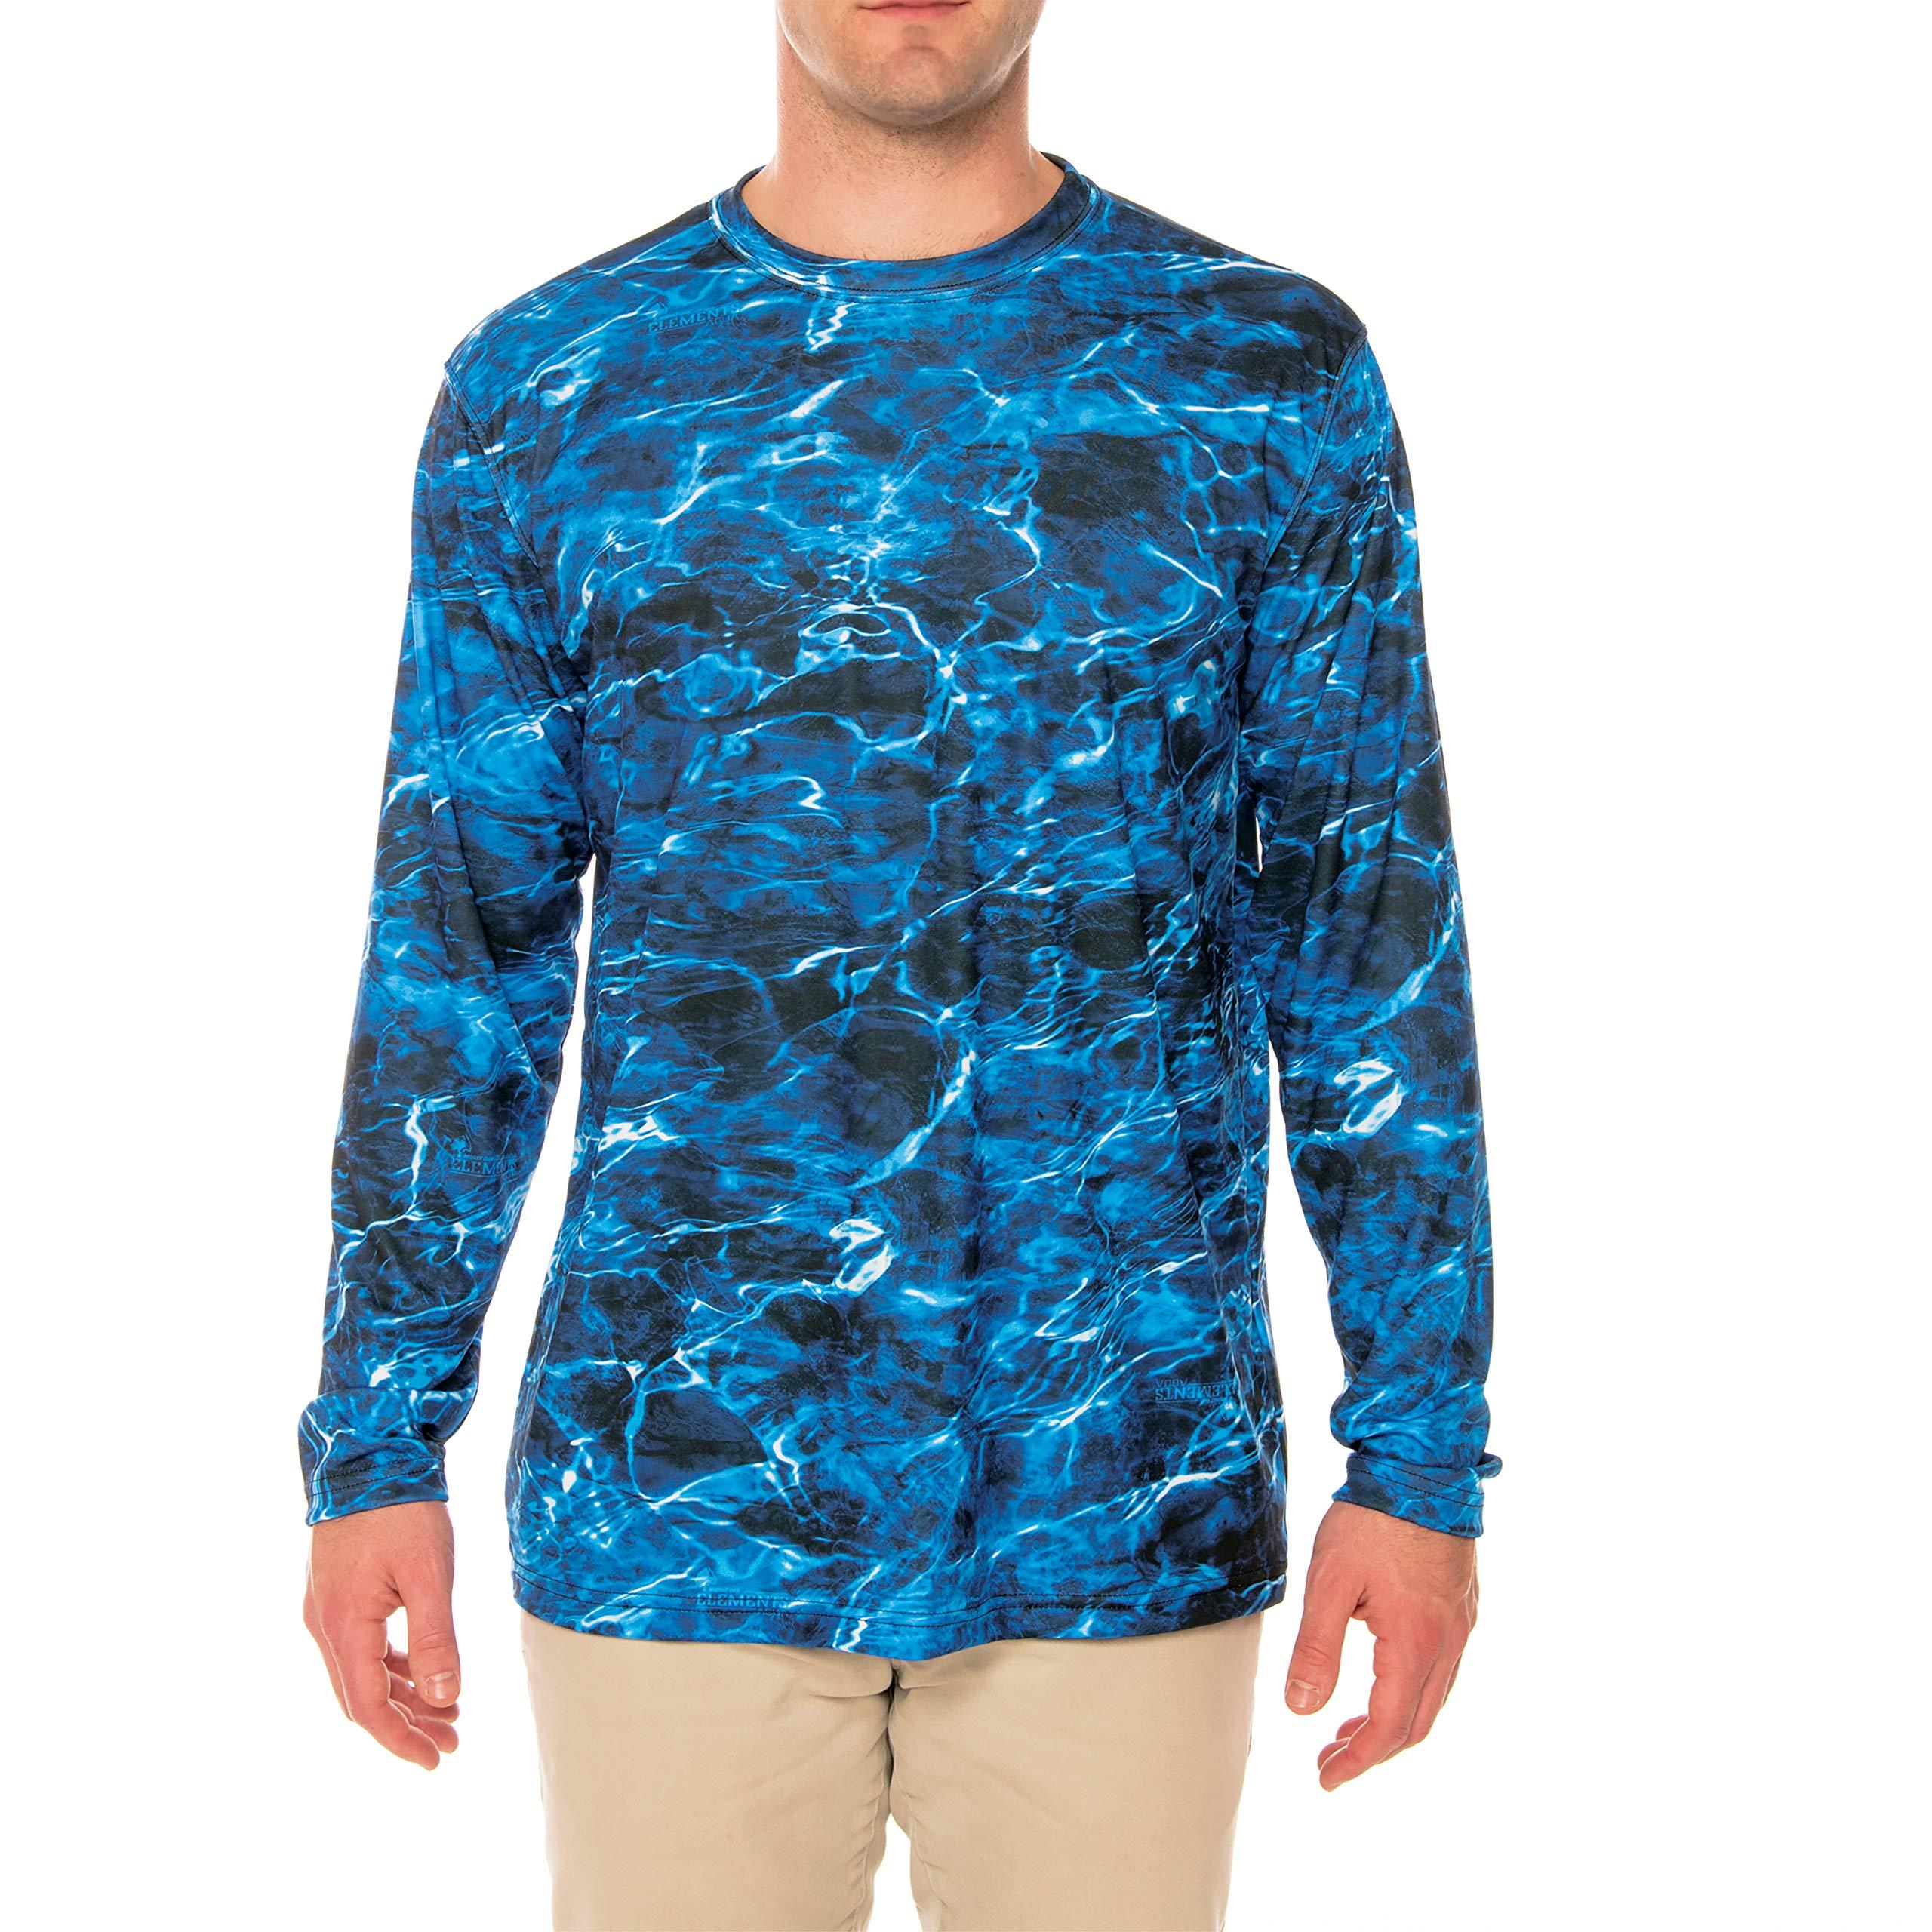 Vapor Apparel Mossy Oak Elements - Marlin Men's UPF 50+ Long Sleeve T-Shirt Large